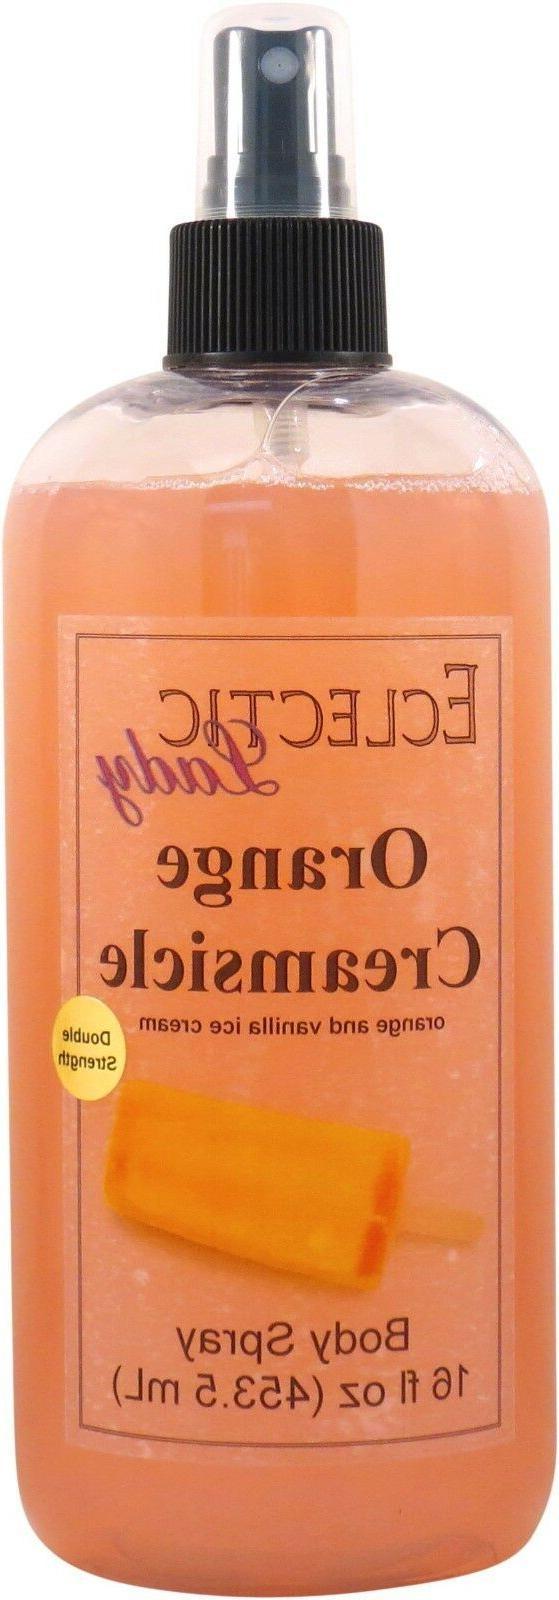 Orange Creamsicle Body Spray